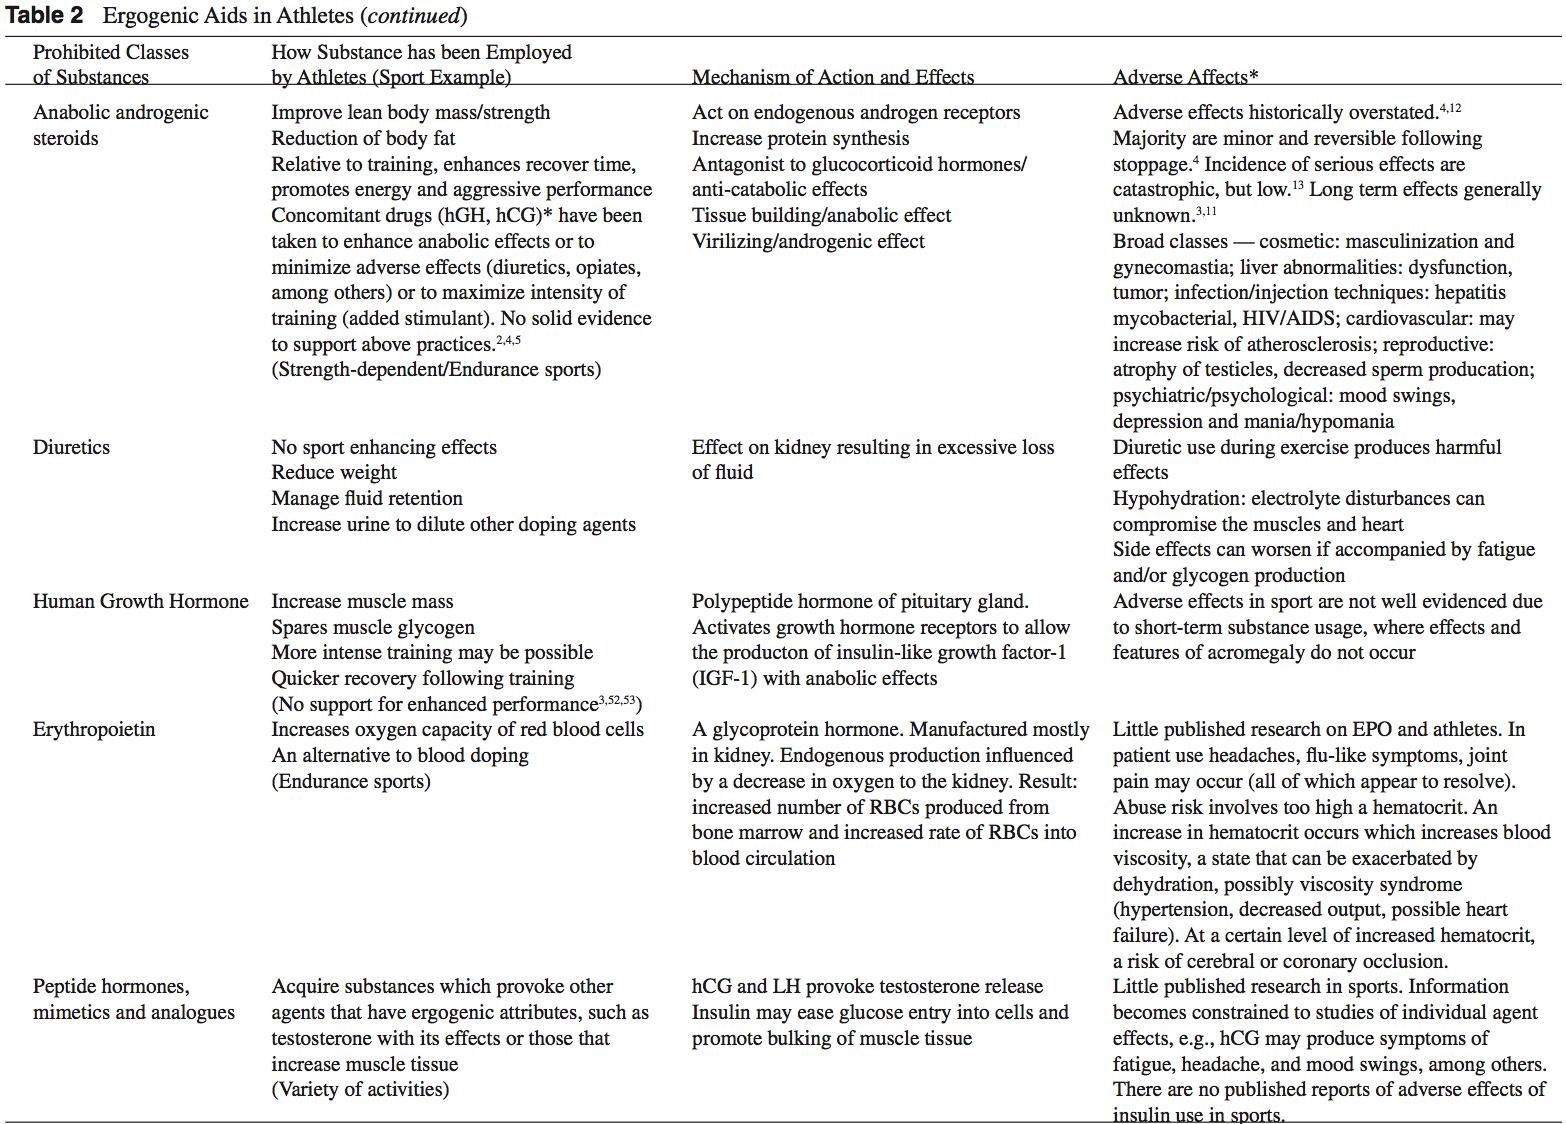 ergogenic table 2 contd